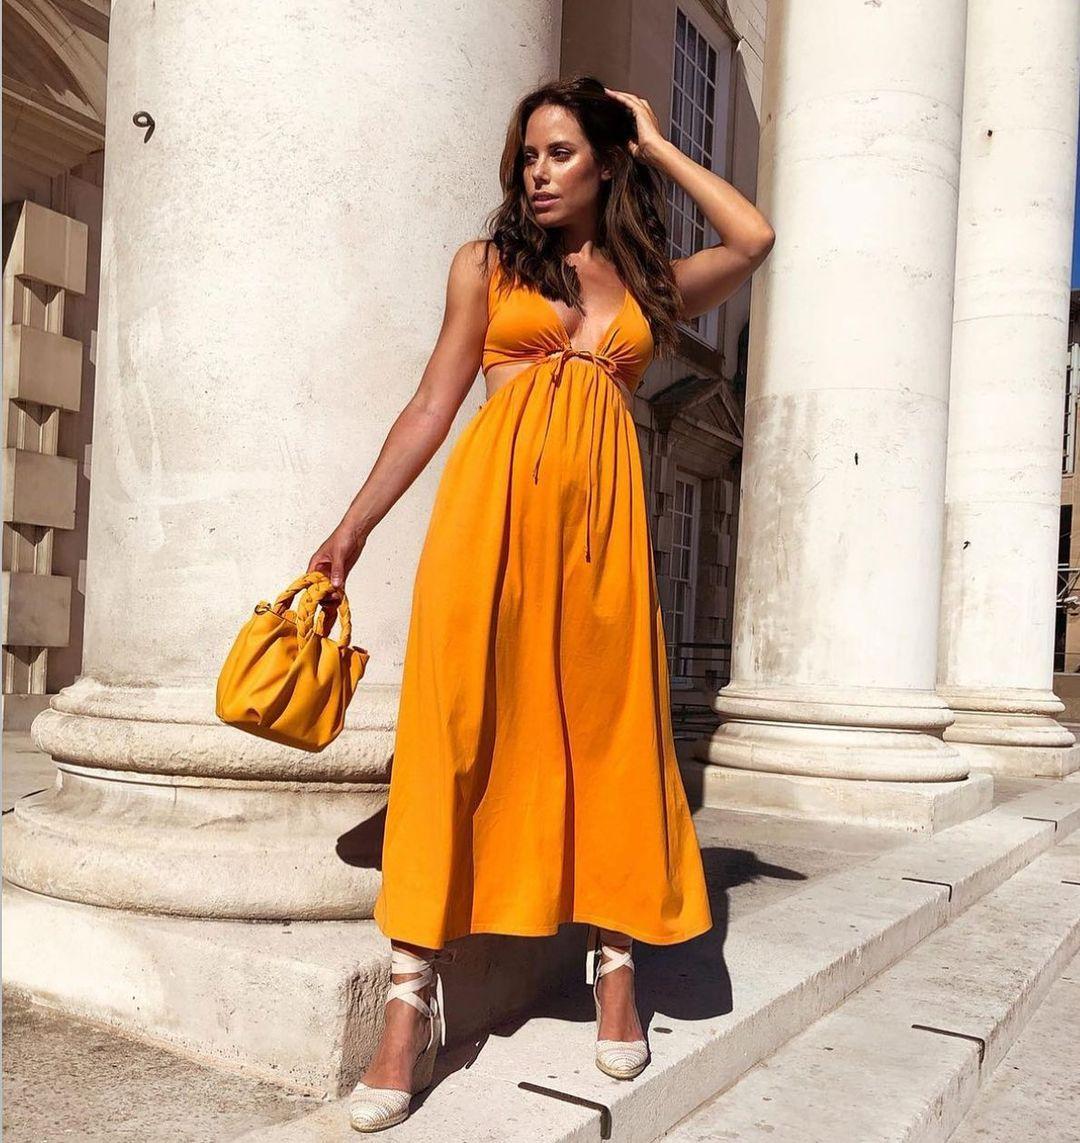 openwork dress de Zara sur zara.style.daily